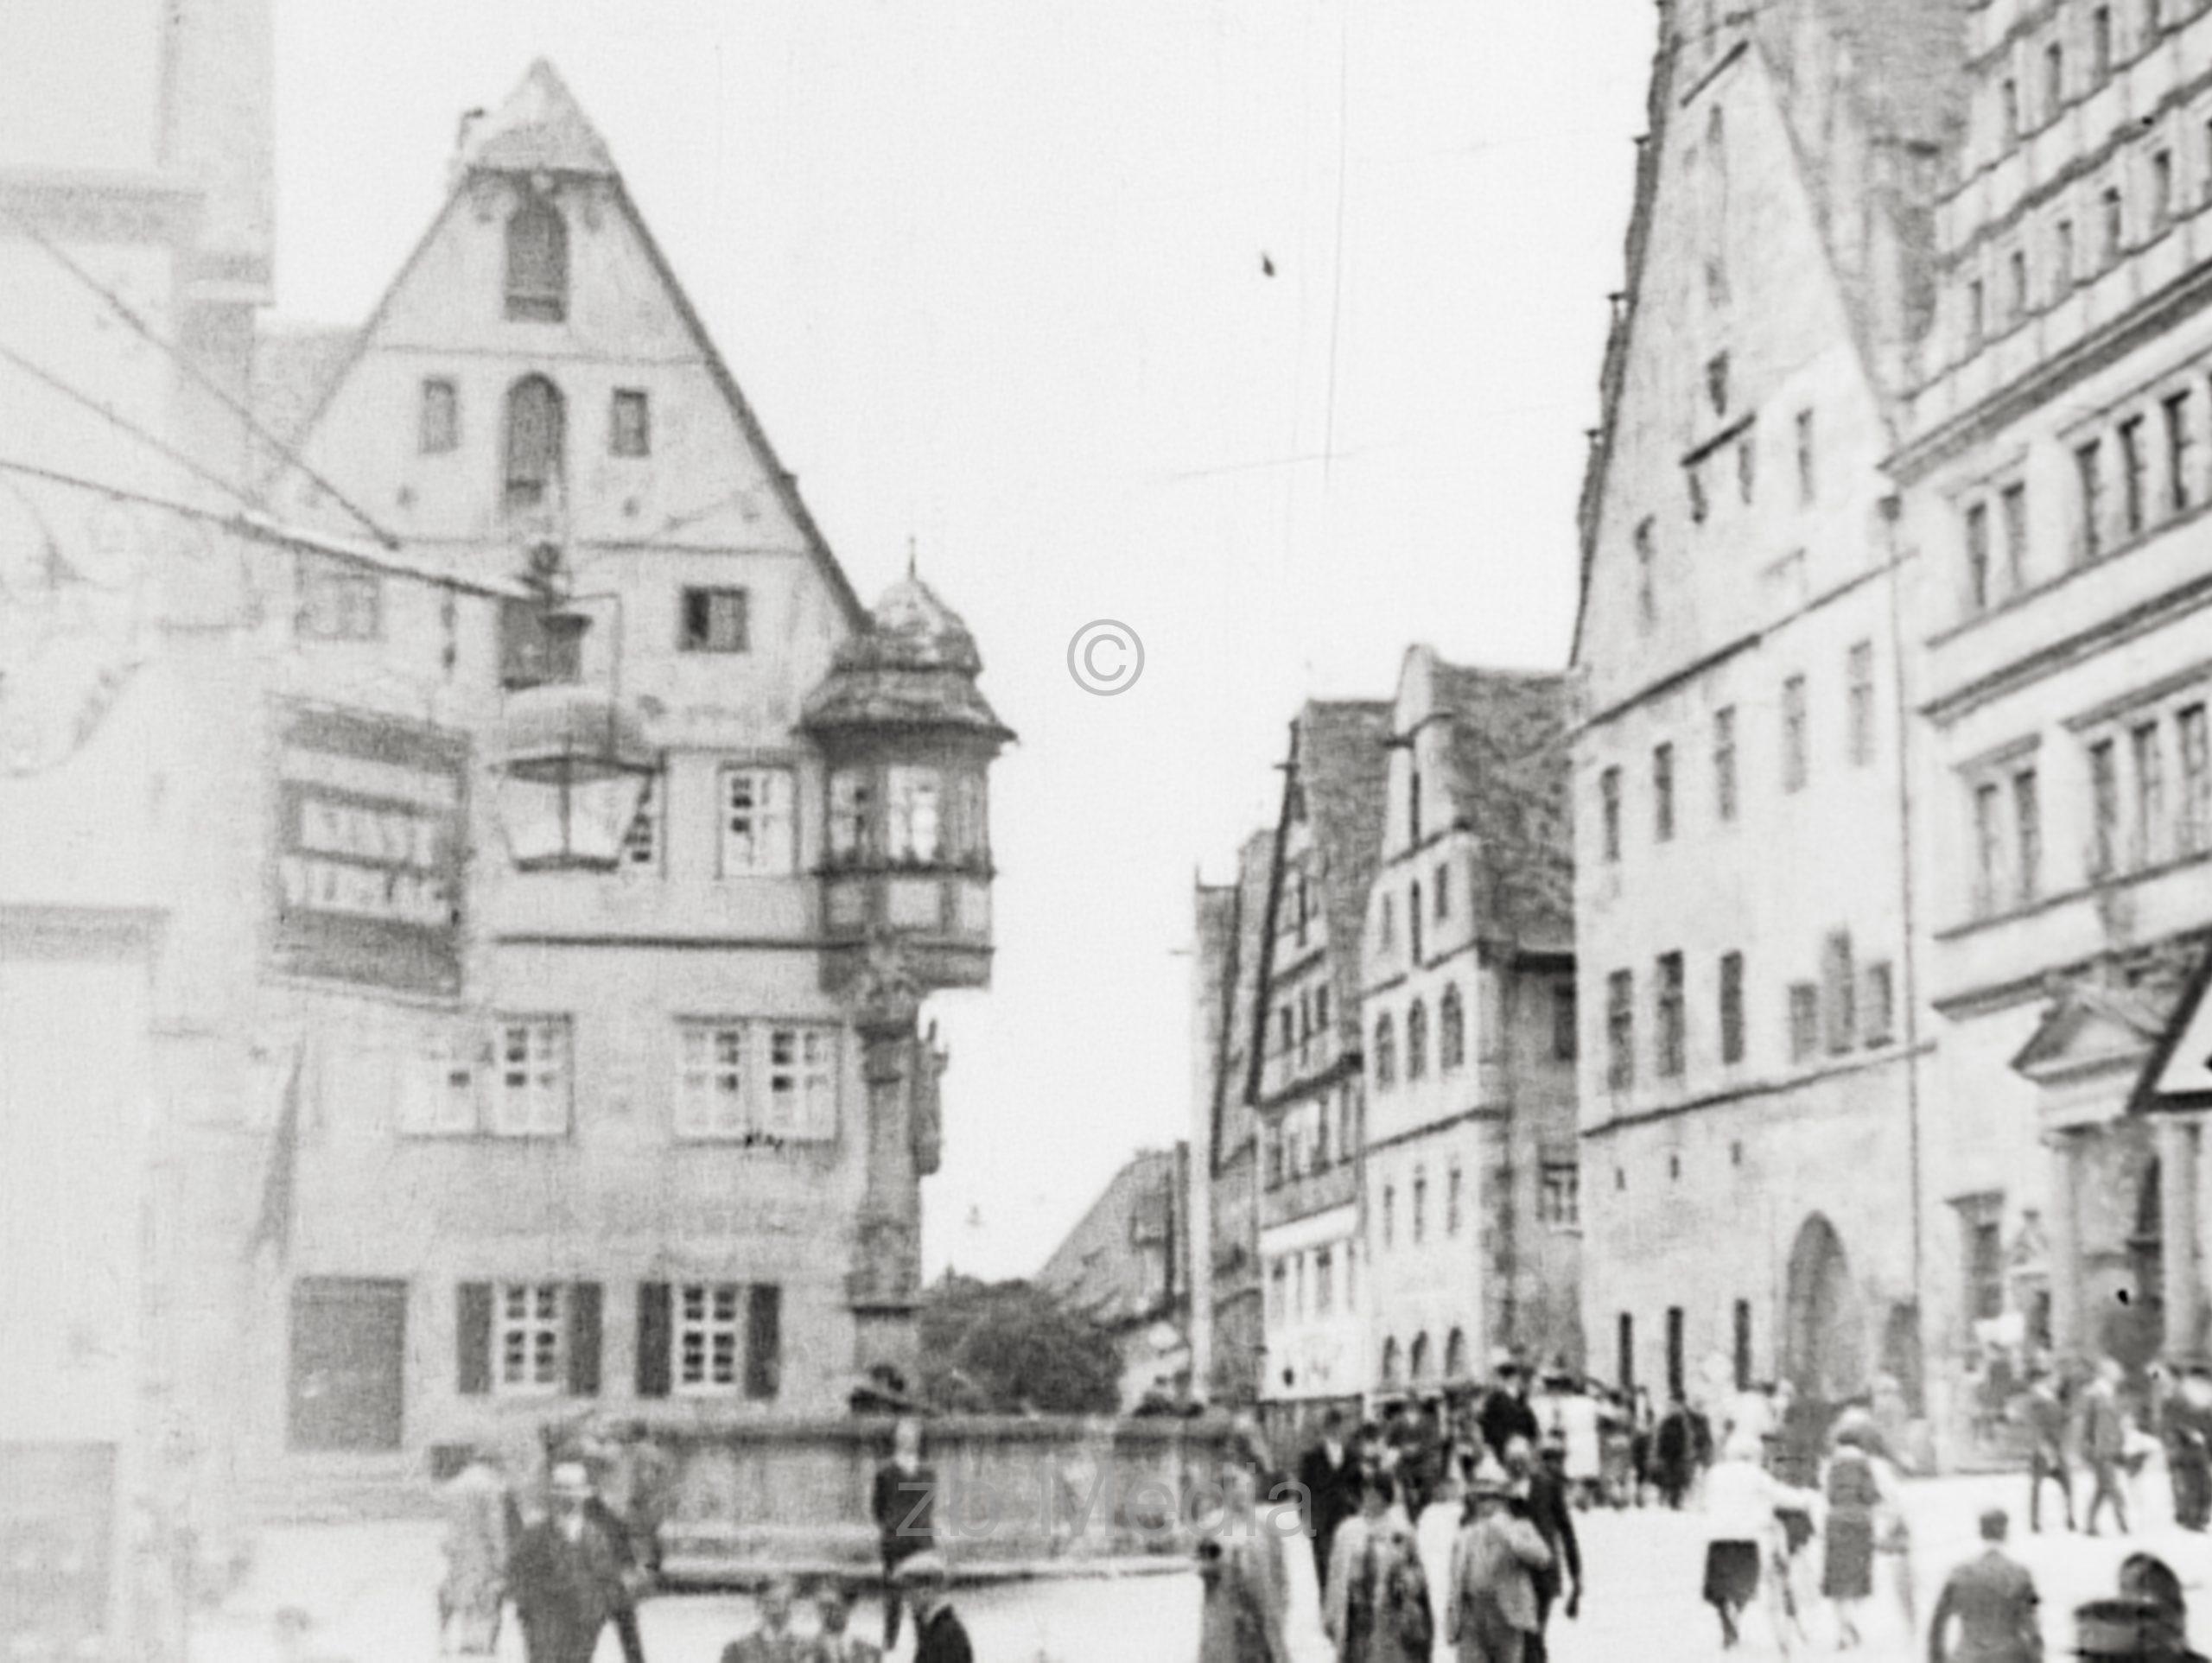 Rothenburg 1930